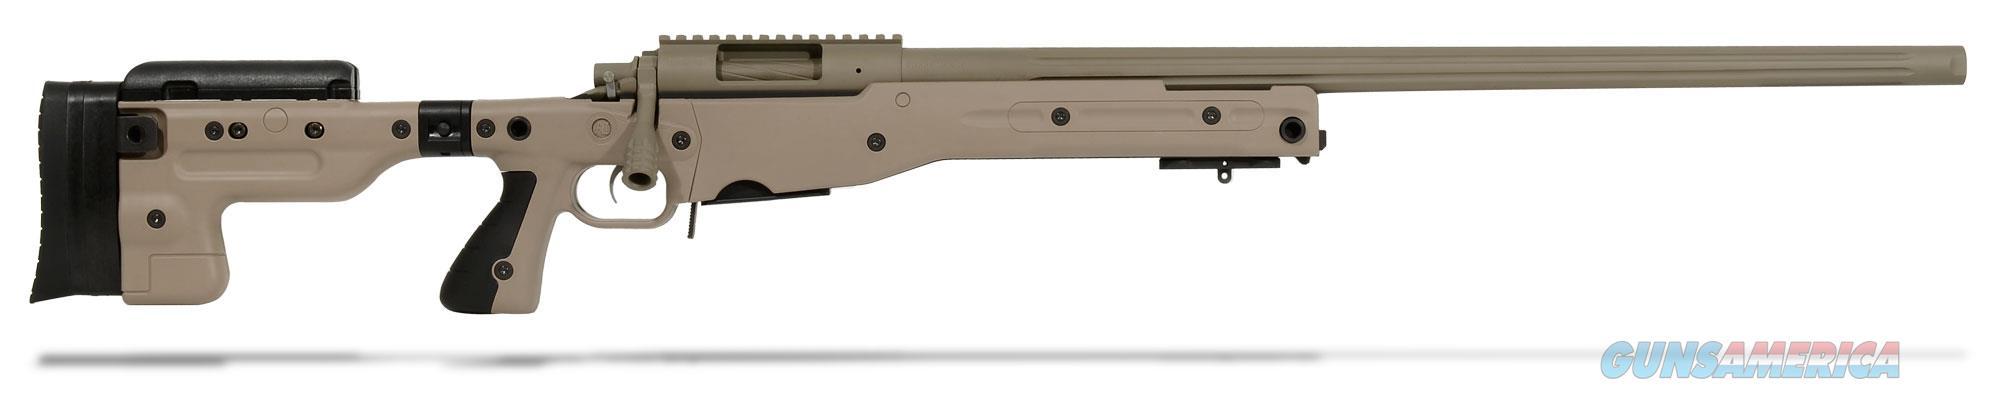 Surgeon Scalpel 6.5 Creedmoor FDE Rifle  Guns > Rifles > S Misc Rifles